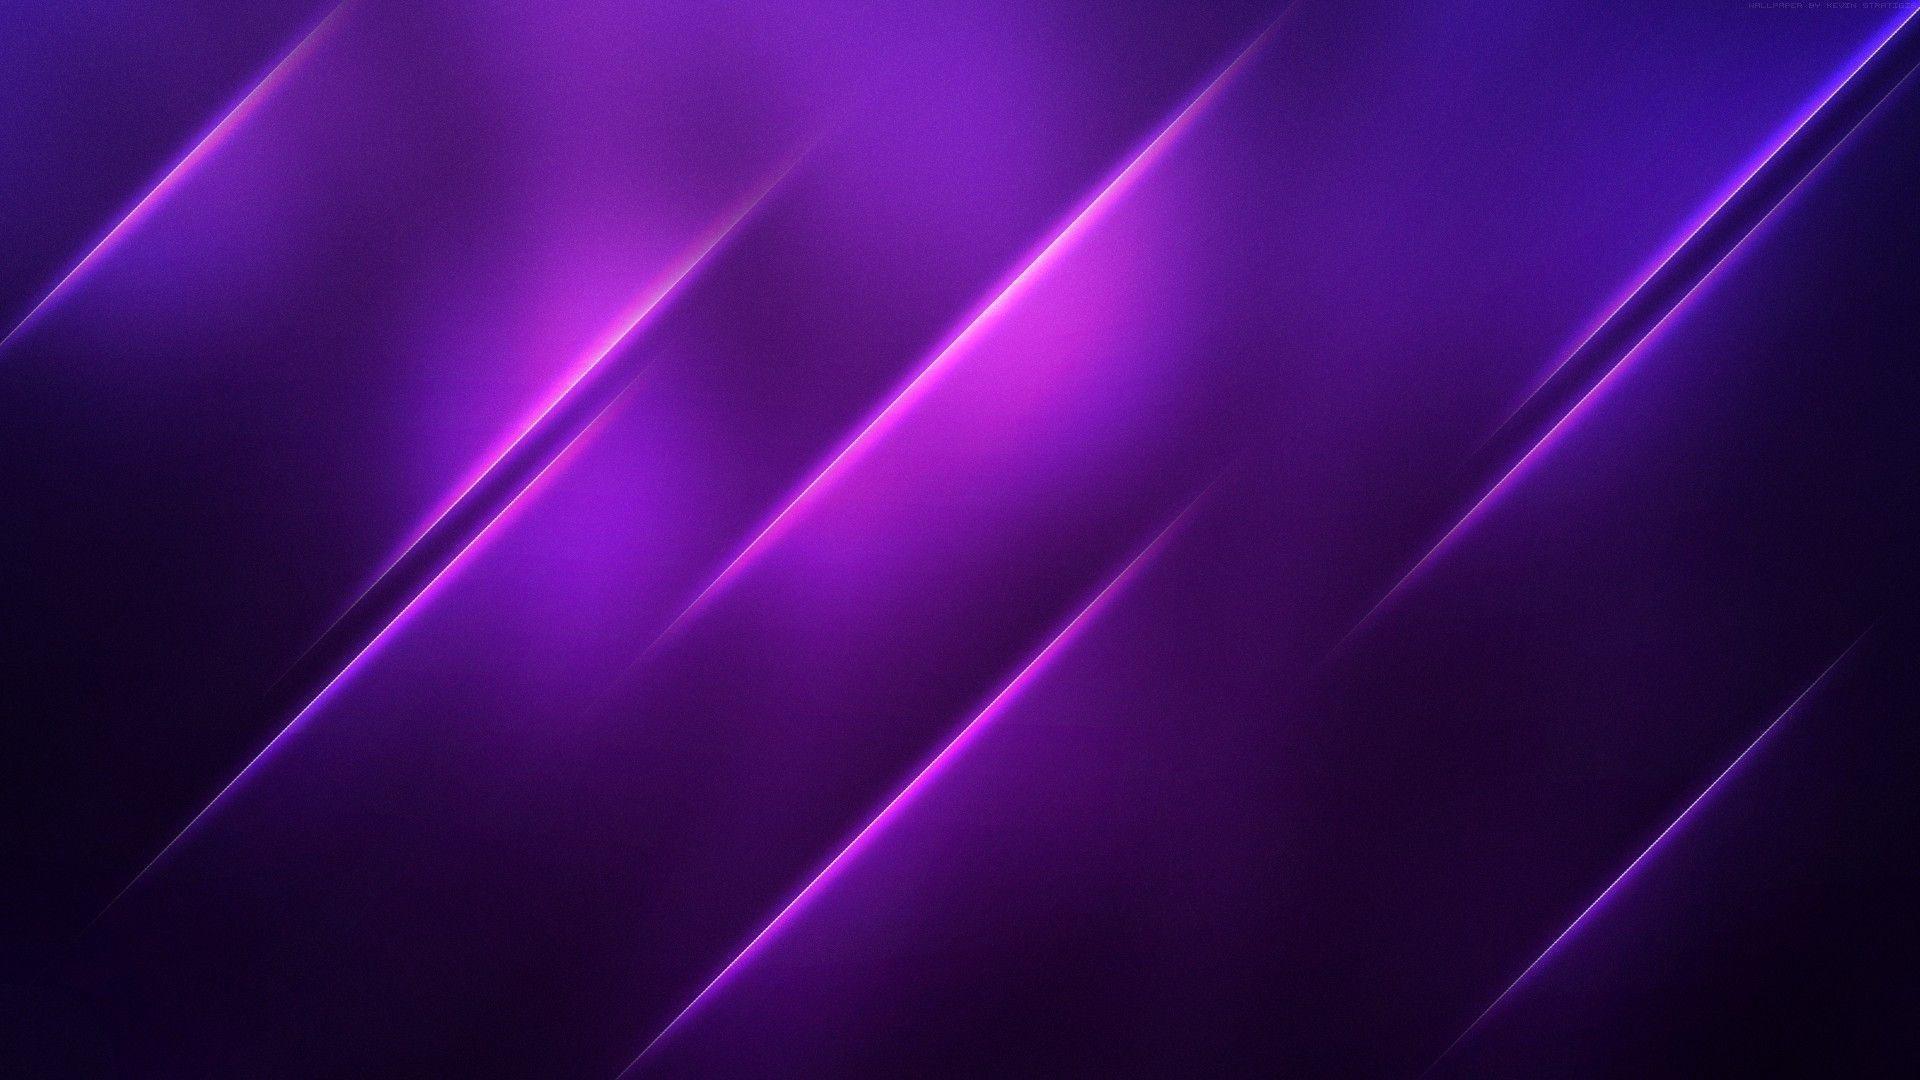 Purple Backgrounds HD 1920x1080